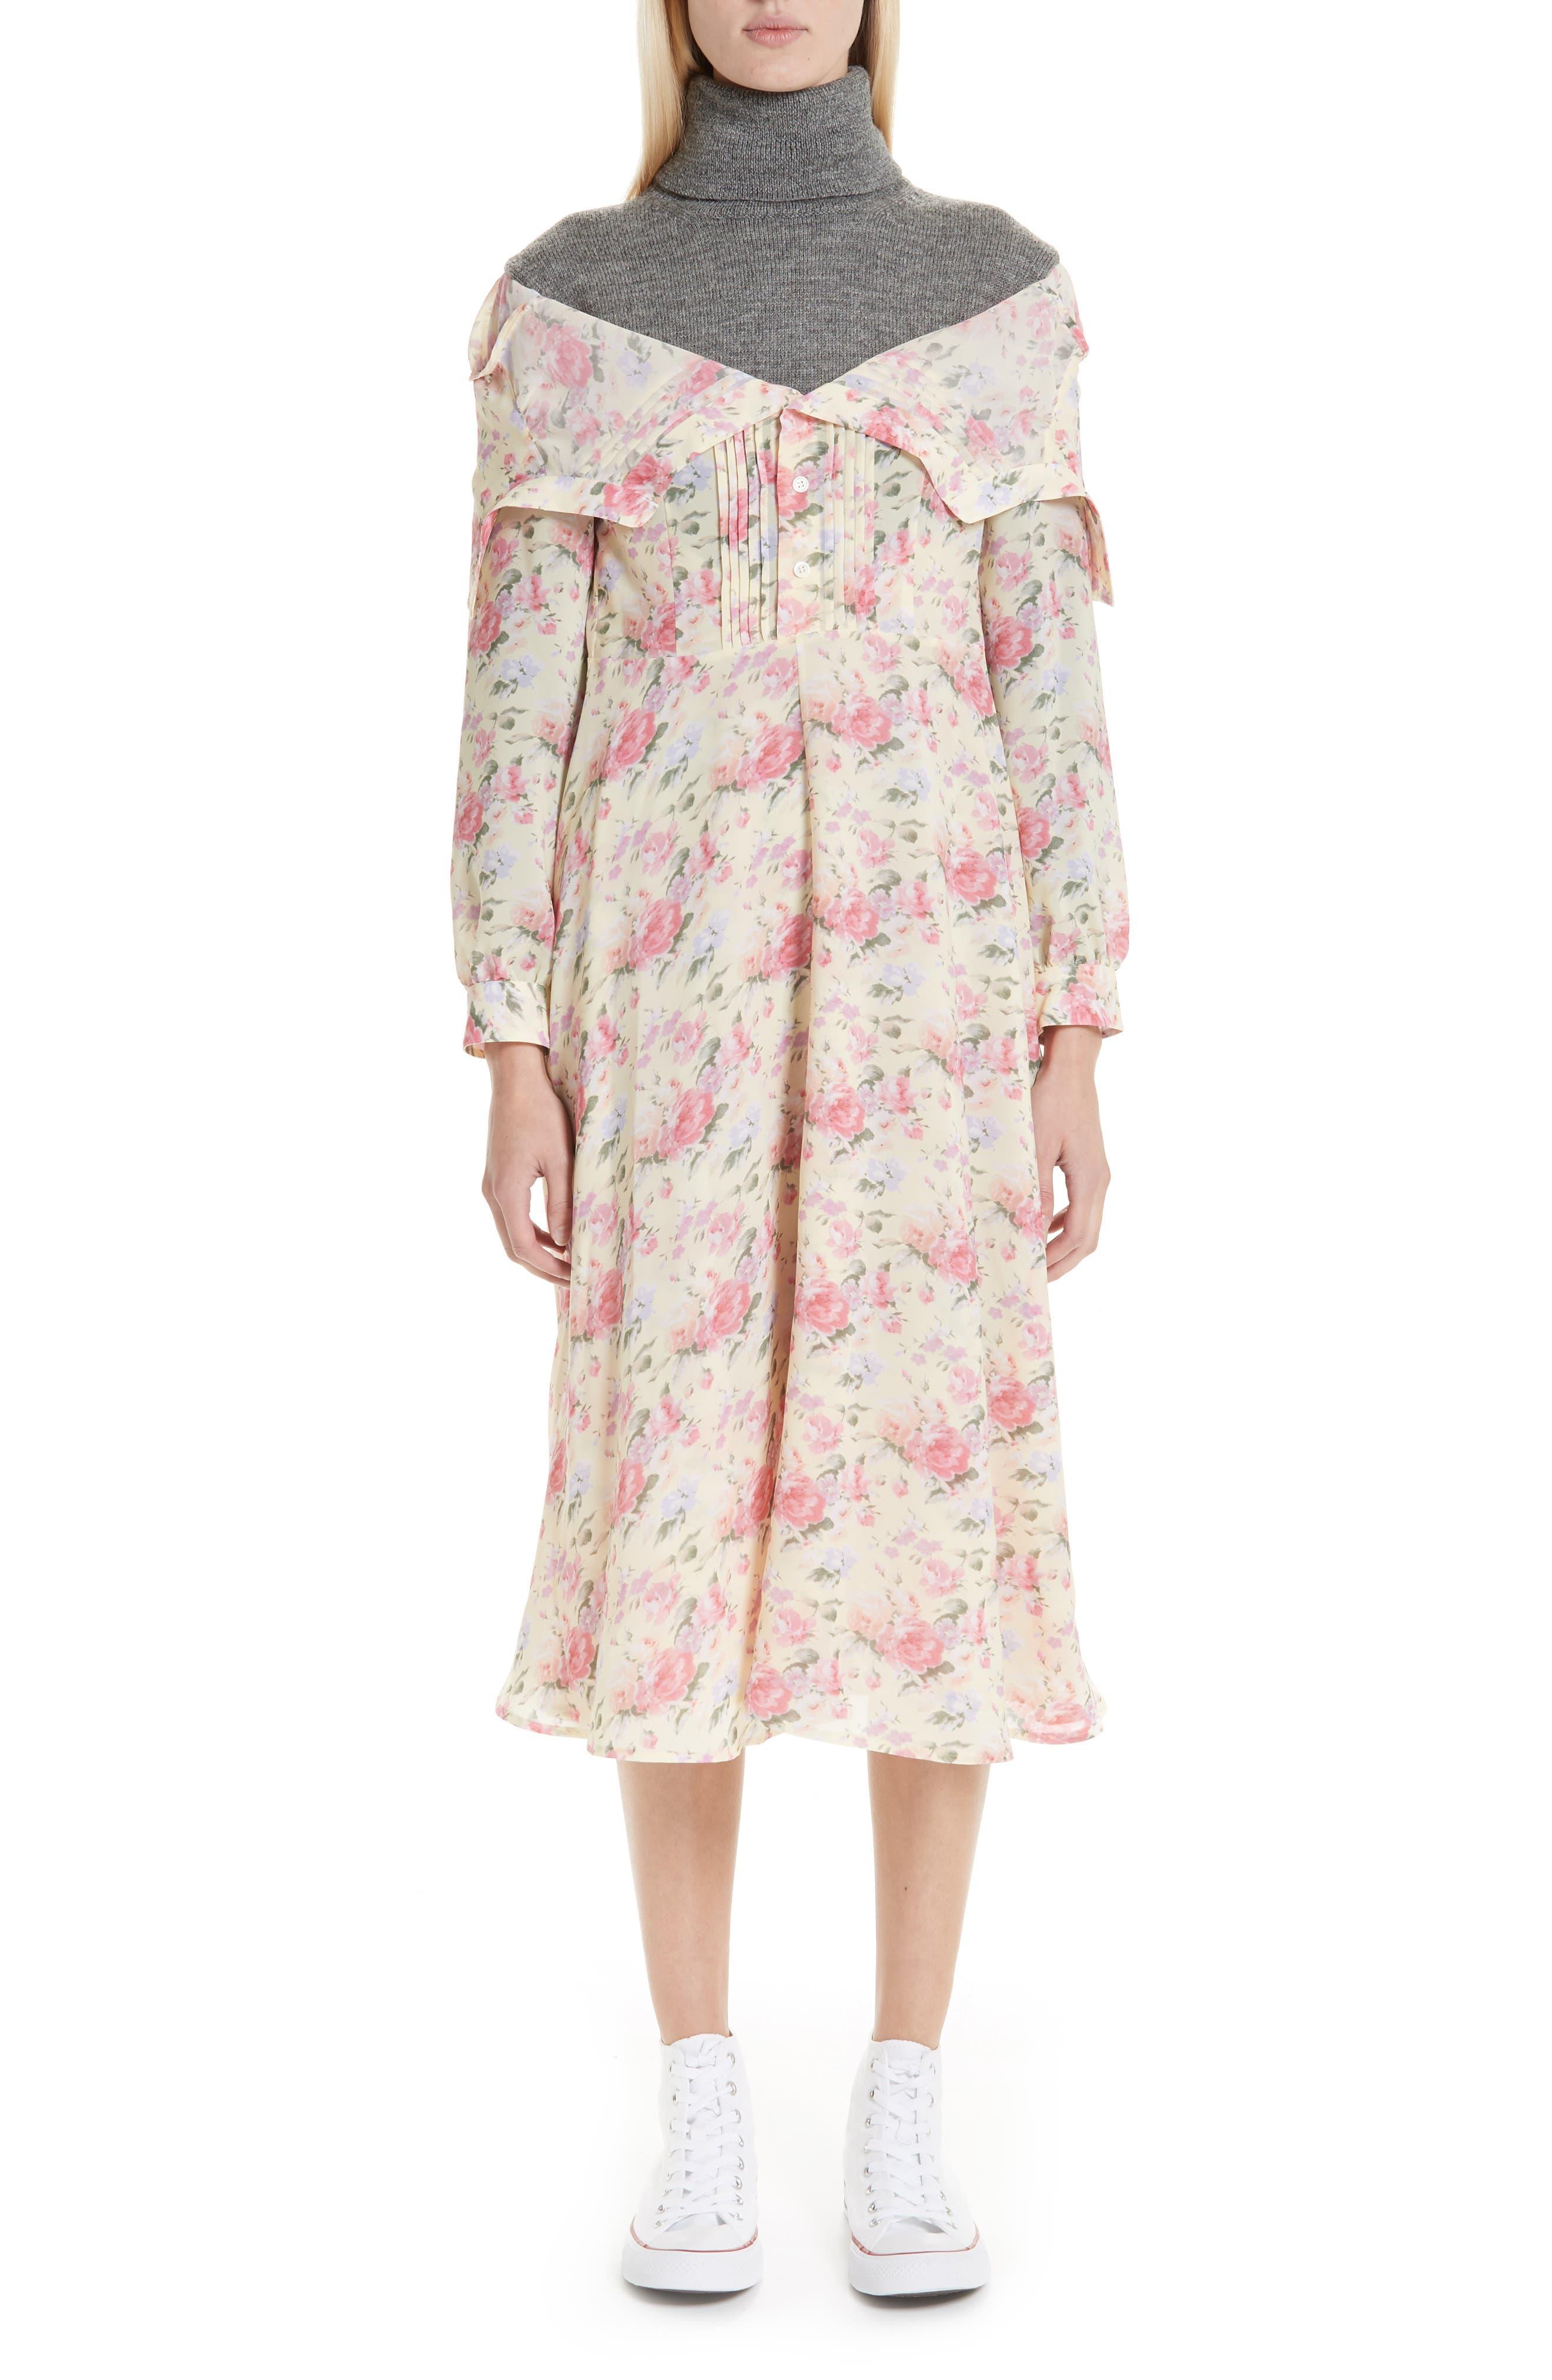 Mixed Media Floral Turtleneck Dress,                         Main,                         color, YELLOW/ PINK/ PPL/ GREY